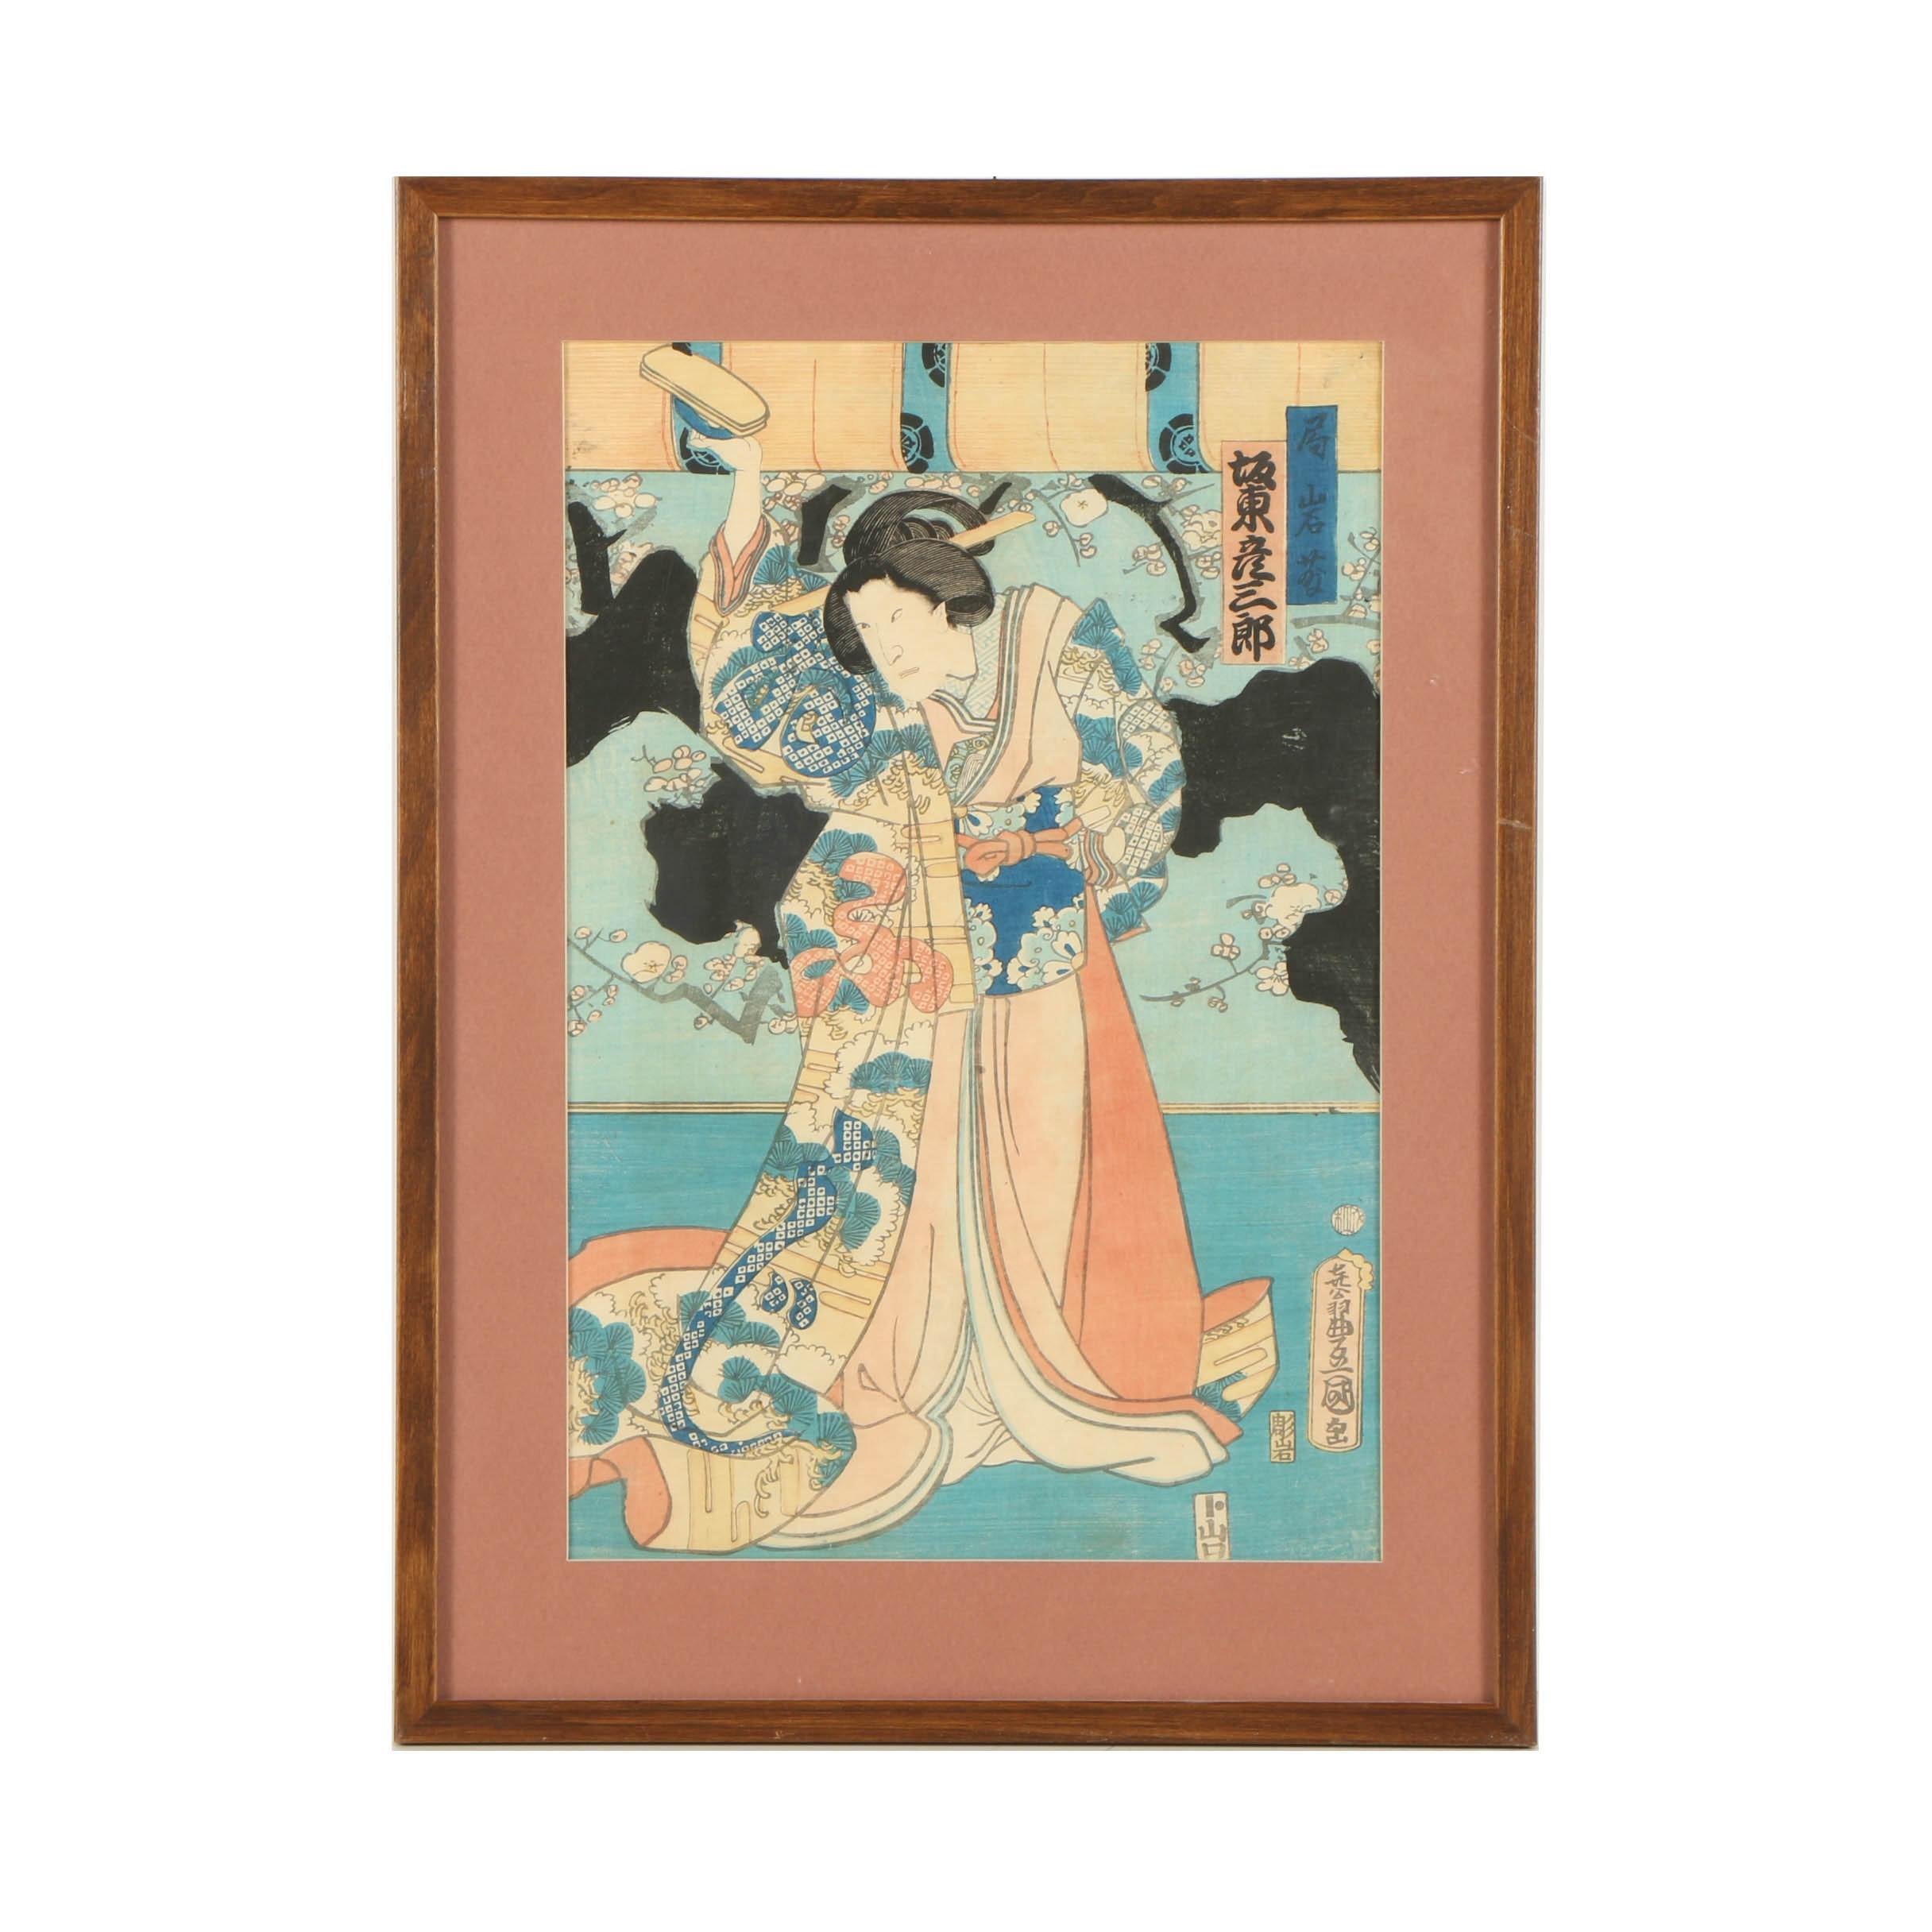 Utagawa Kunisada Woodblock Print of the Kabuki Actor Bando Hikosaburo